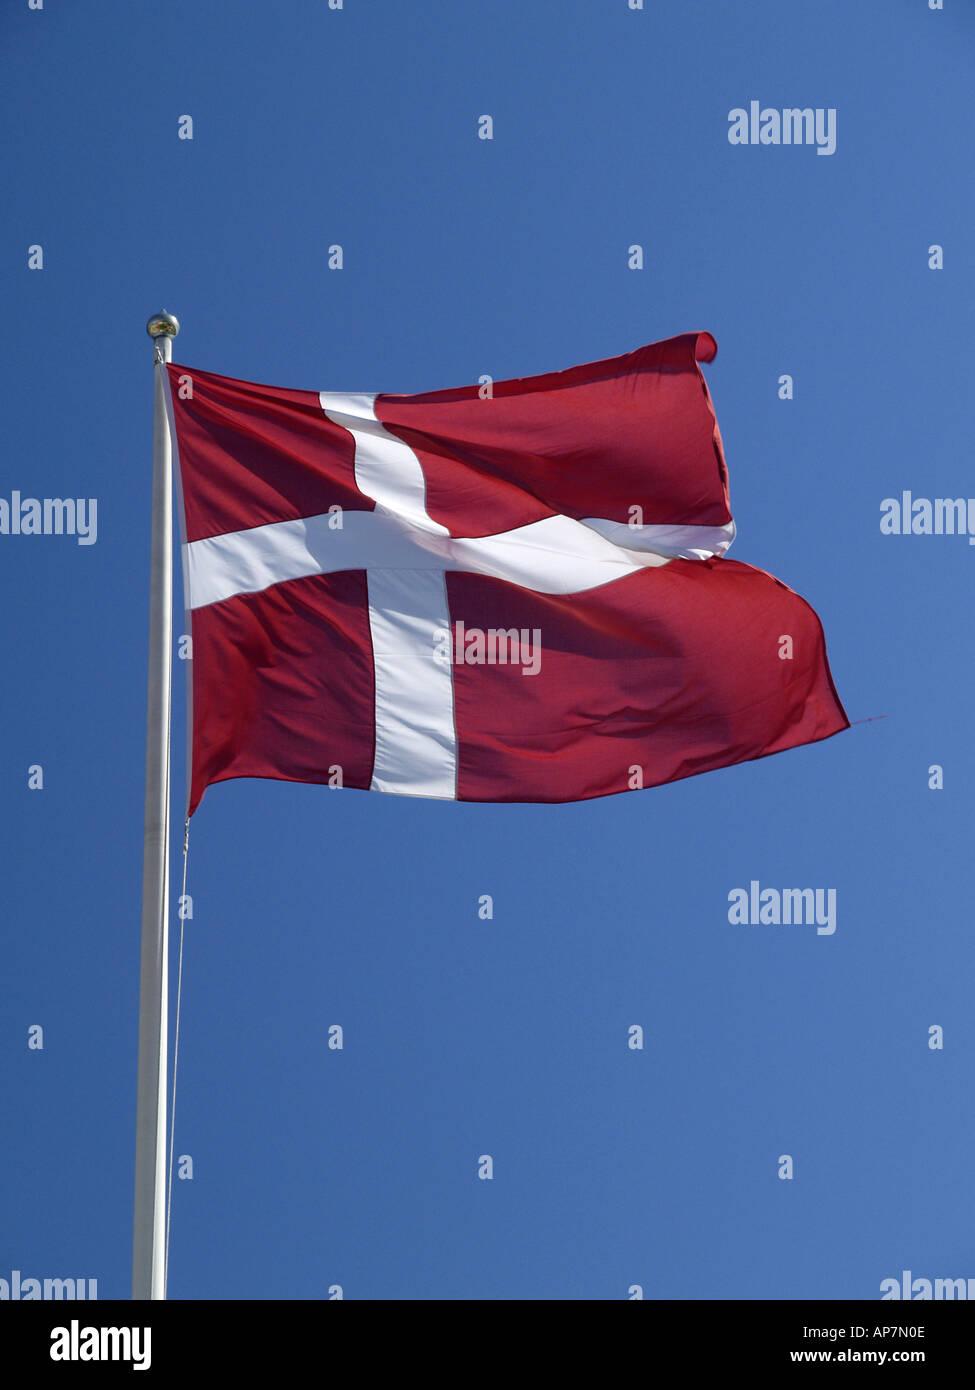 Danish flag, Dannebrog - Stock Image